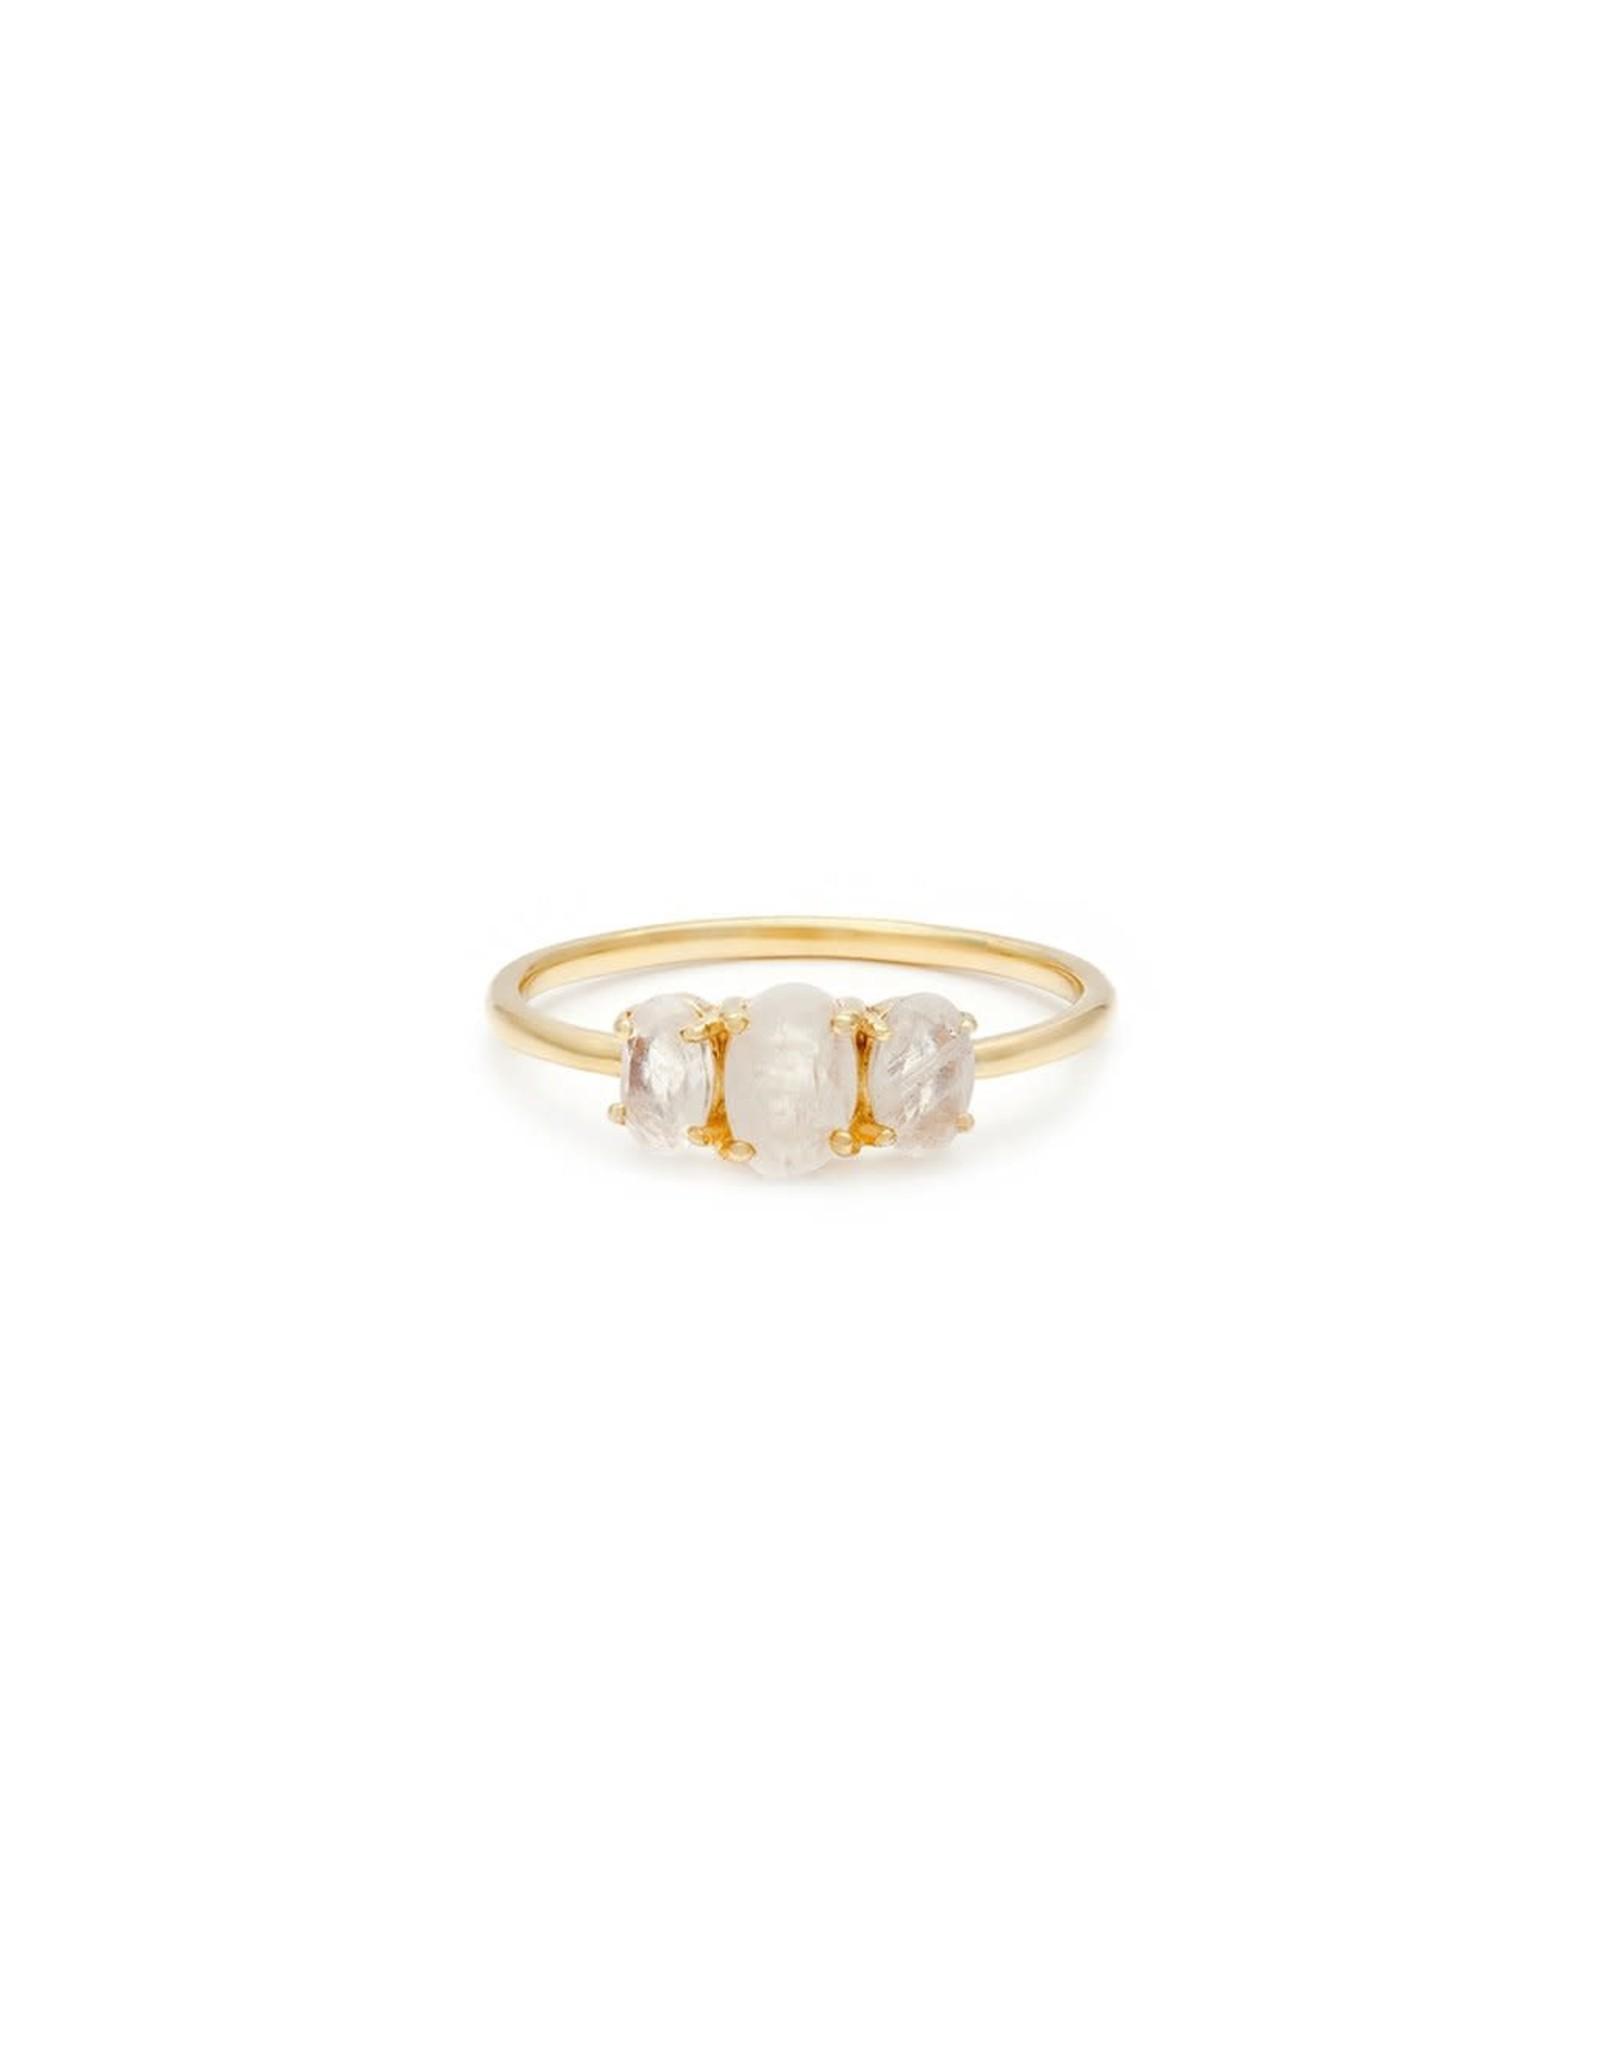 leah alexandra Bijou Ring | Moonstone